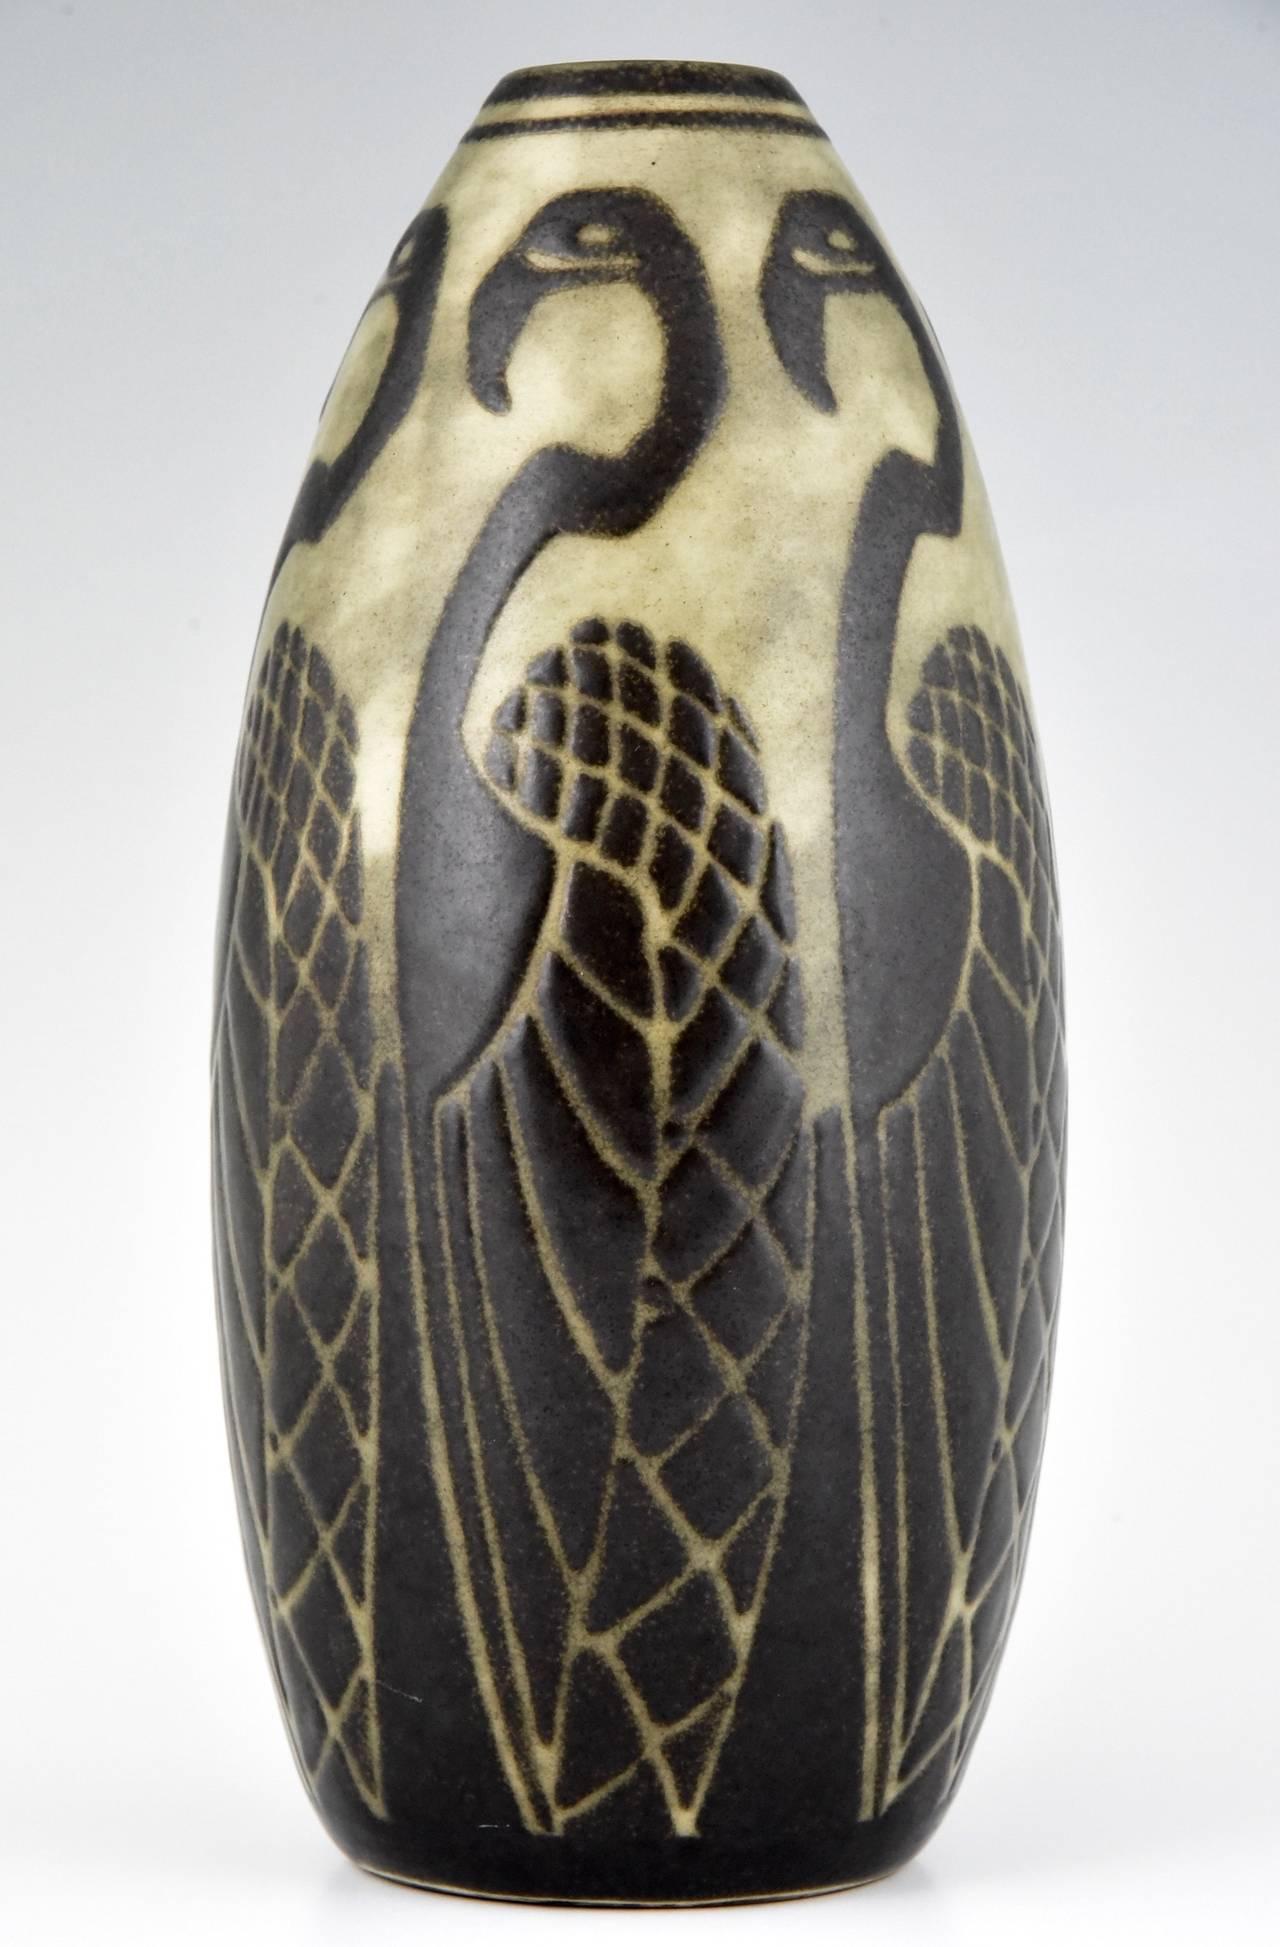 Art Deco Flamingo Vase By Charles Catteau Keramis Belgium